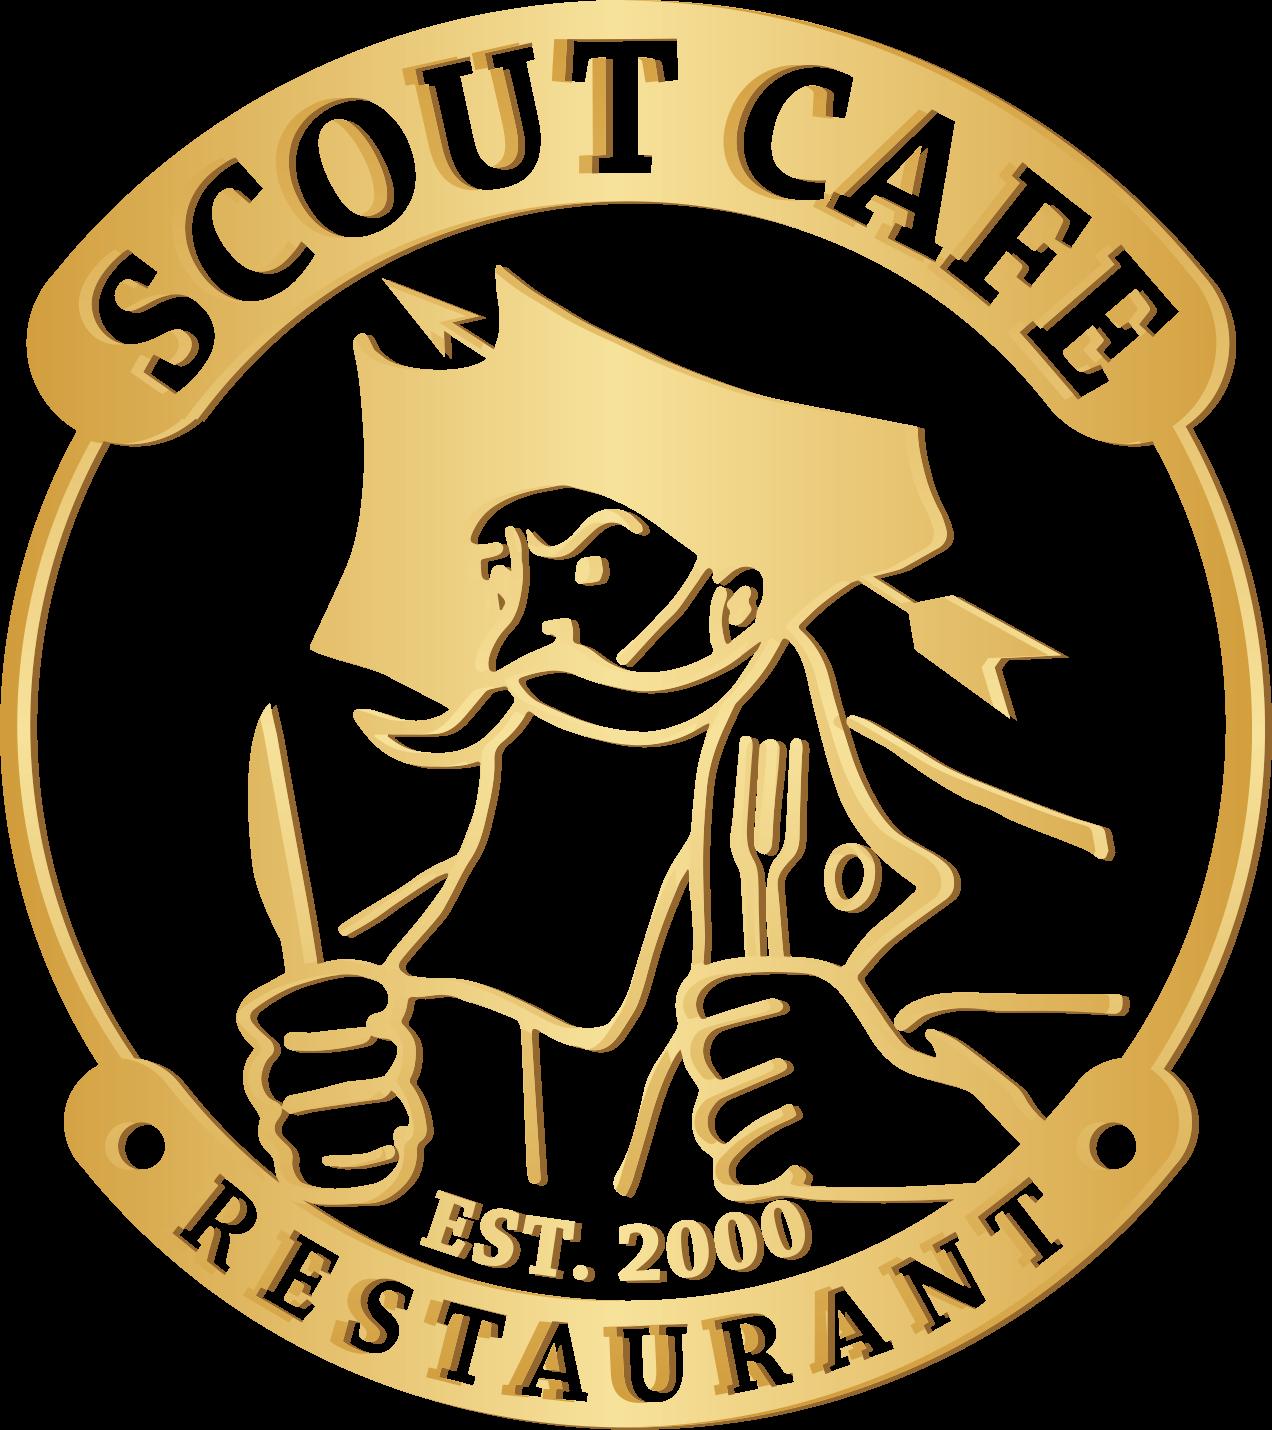 Scout Cafe & Restaurant